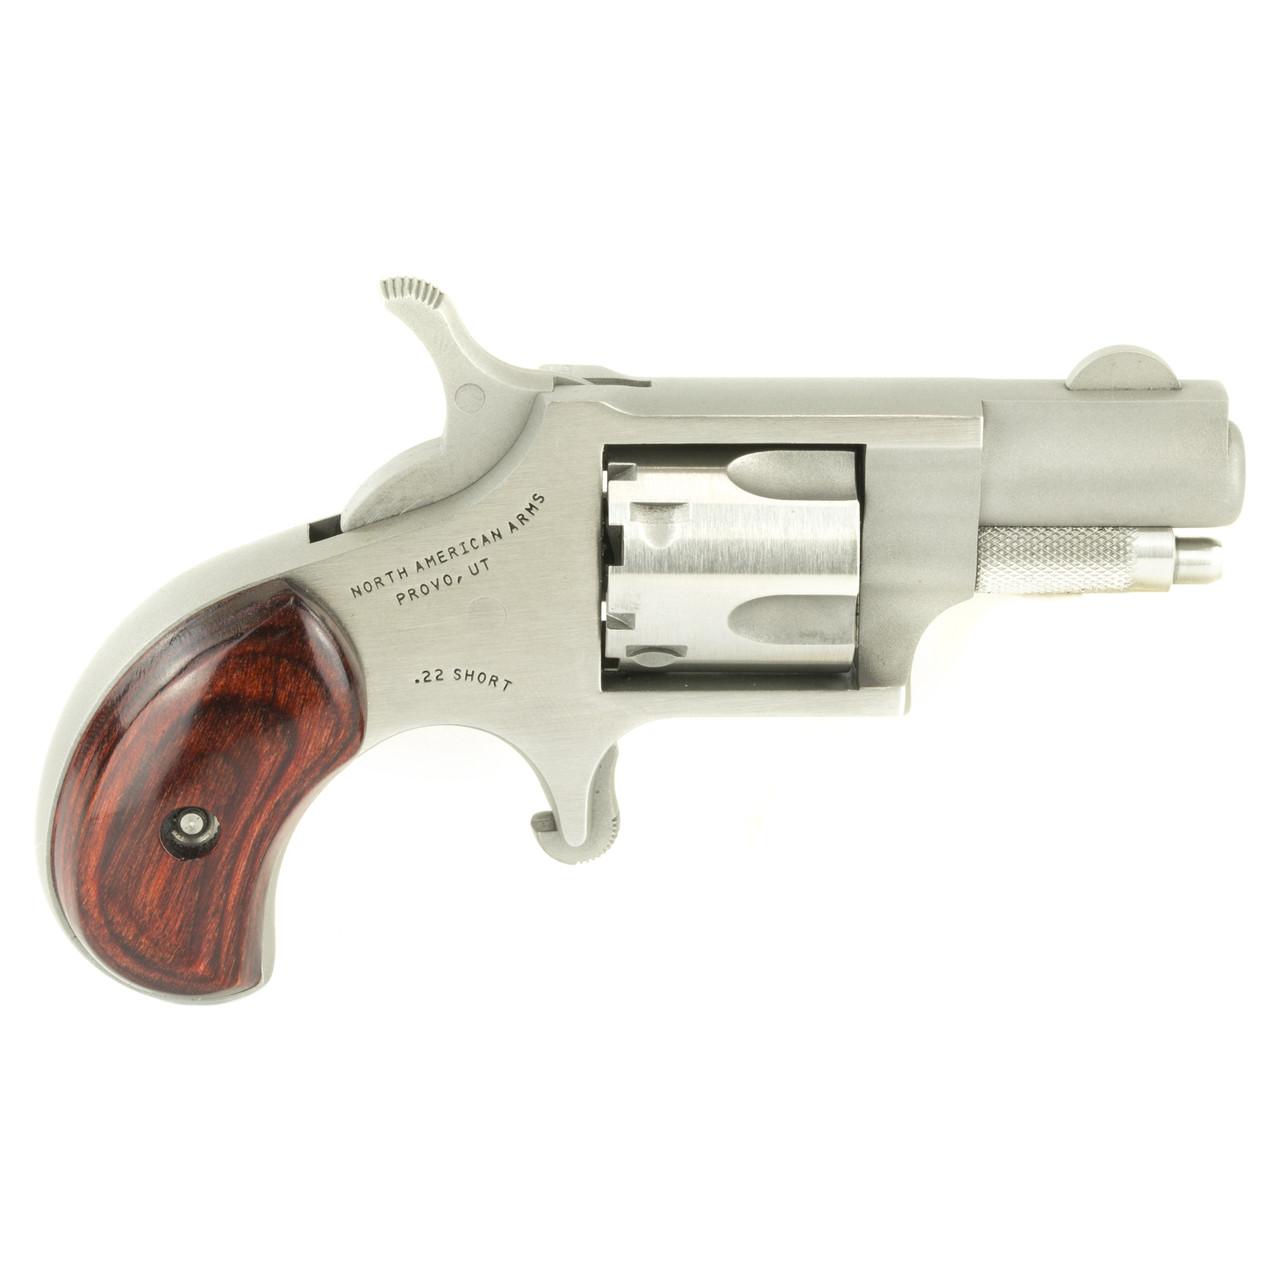 North American Arms Mini Revolver, Single Action, 22 Short, 1 125